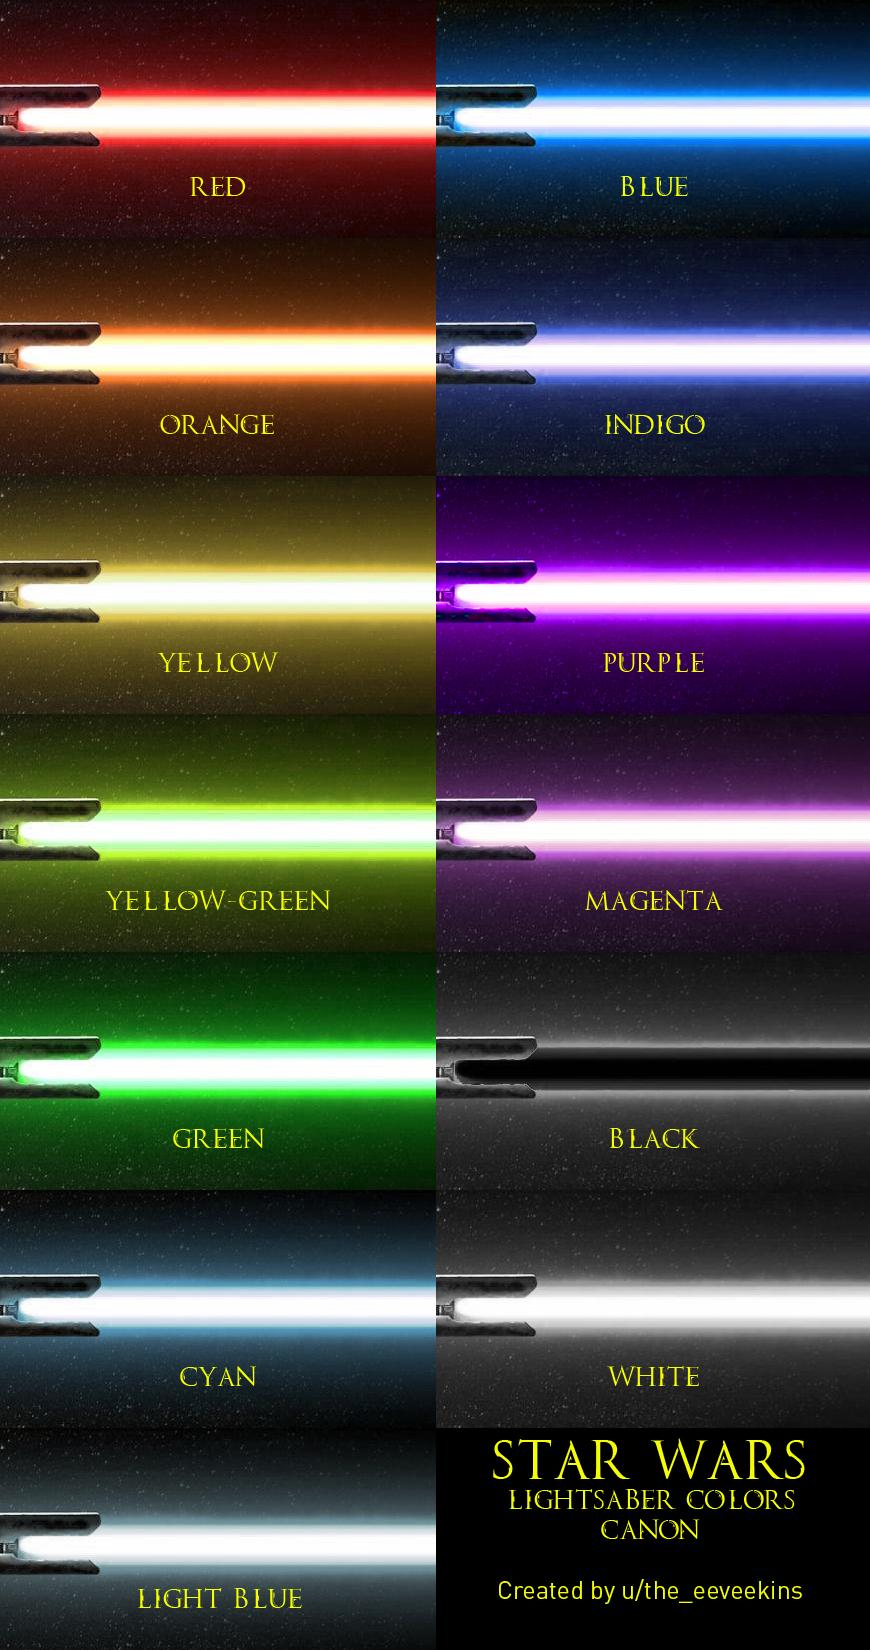 Manga Lightsaber Jedi Lightsaber Exo Lightsaber Darth Vader Lightsaber Lightsaber Storage Yellow Li In 2020 Star Wars Light Saber Lightsaber Colors Star Wars Art